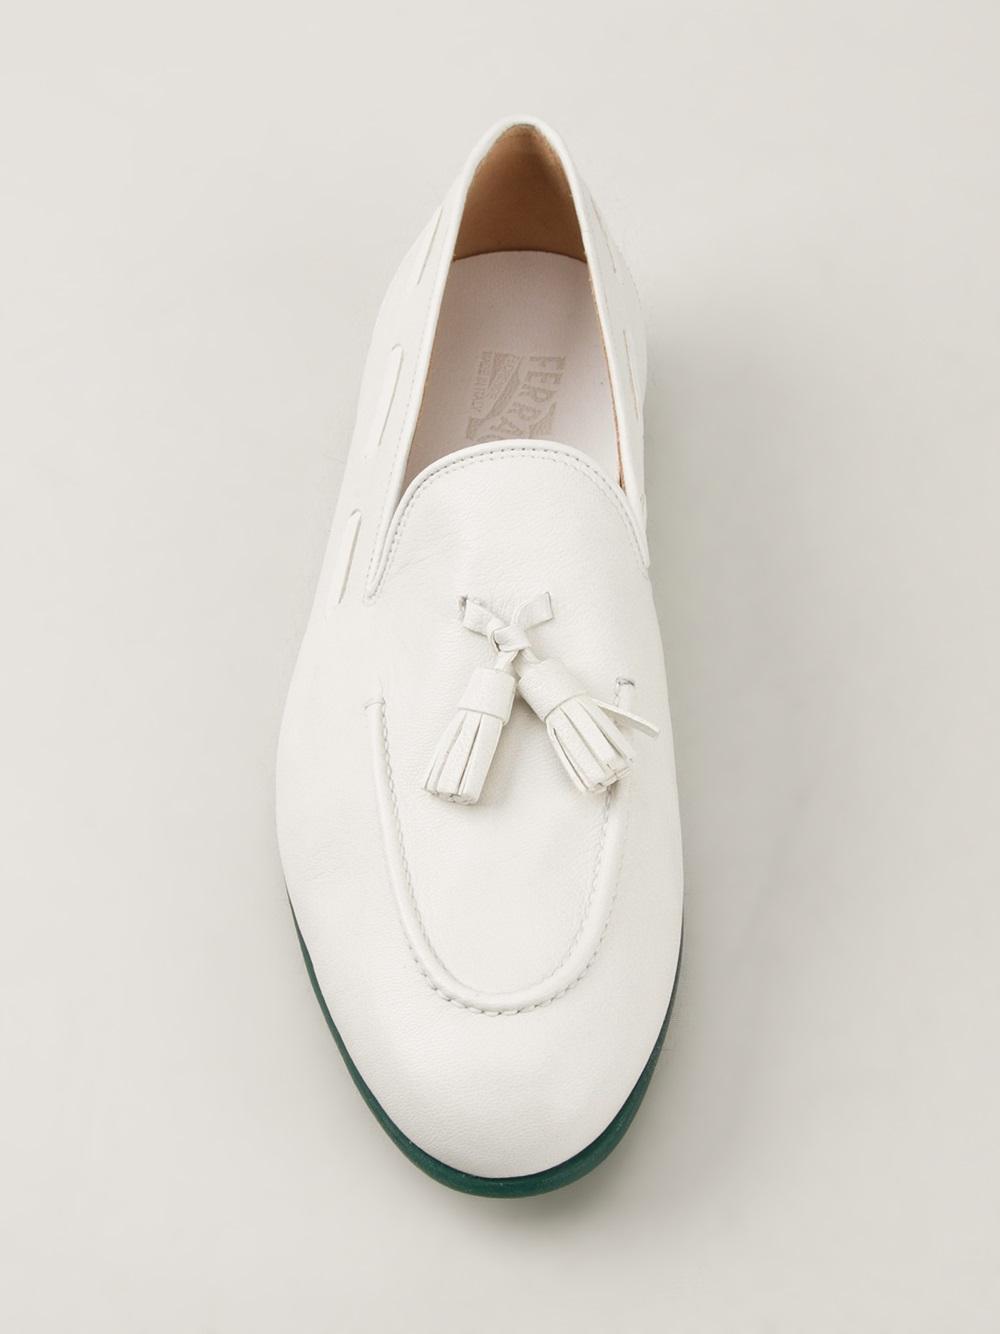 Ferragamo Riva Tassel Loafer in White